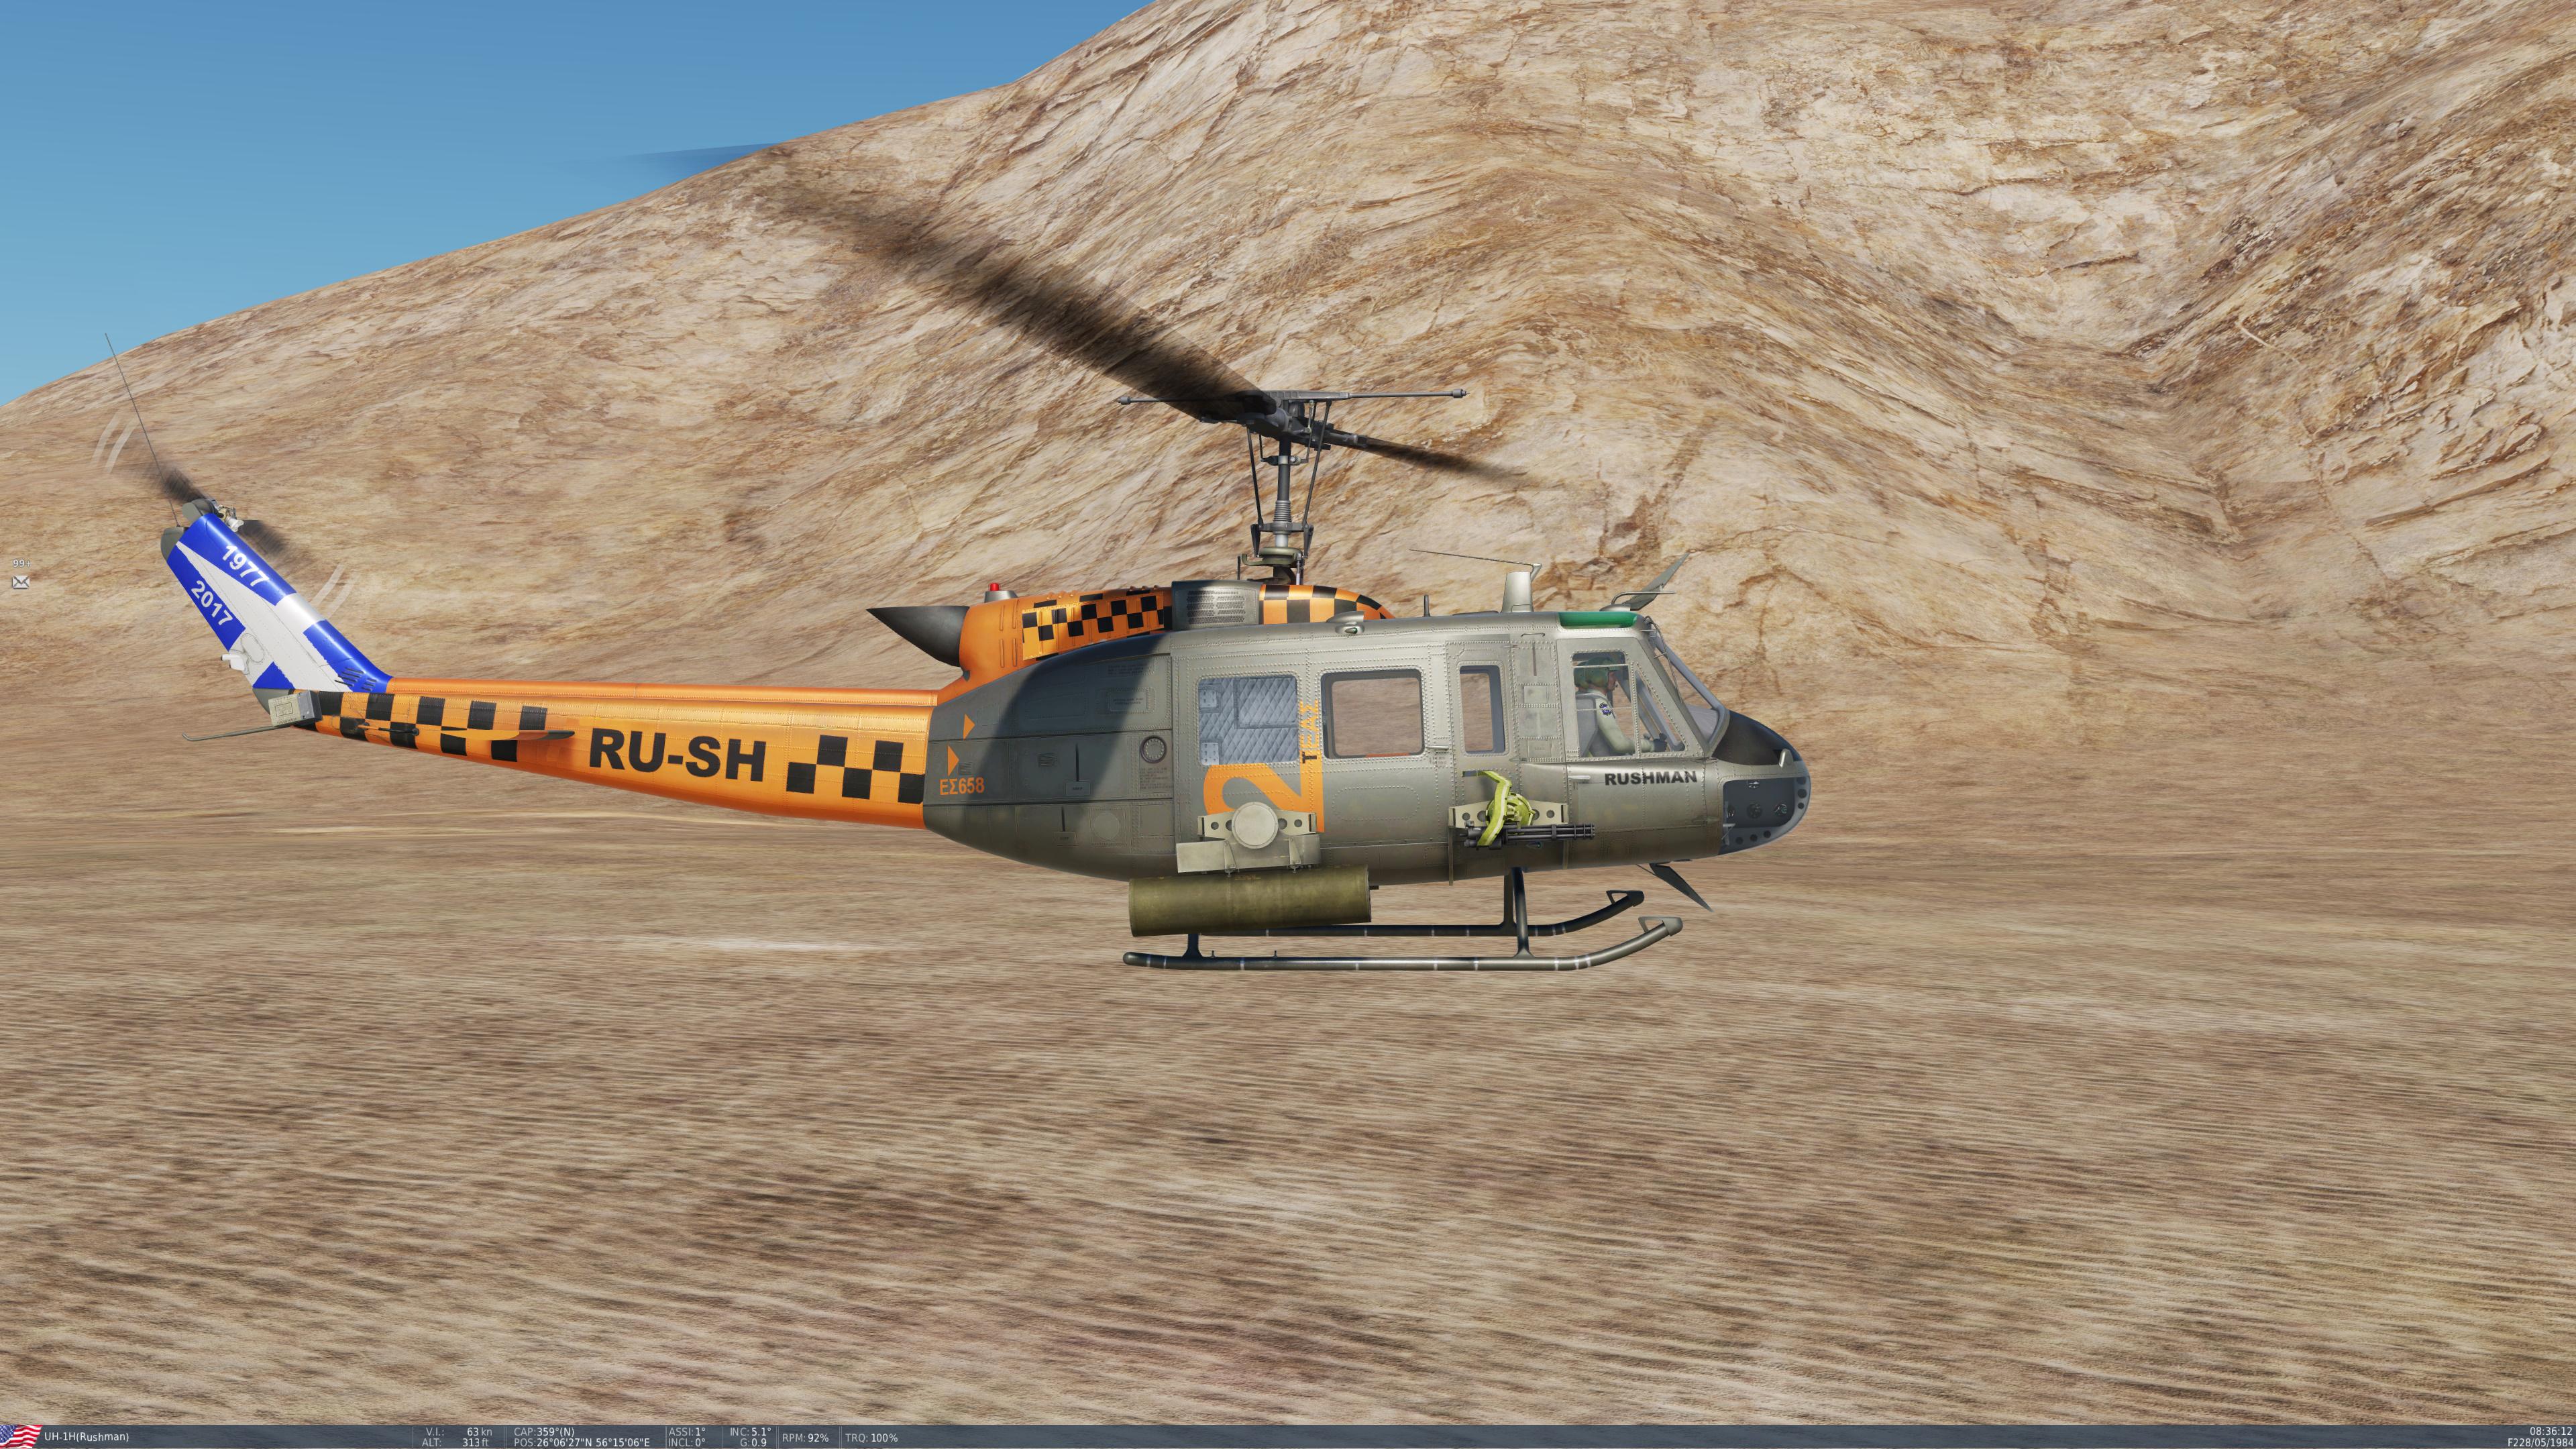 [Cursus UH-1H Huey] Photos de nos missions Bandicam_2021-01-26_22-43-02-598